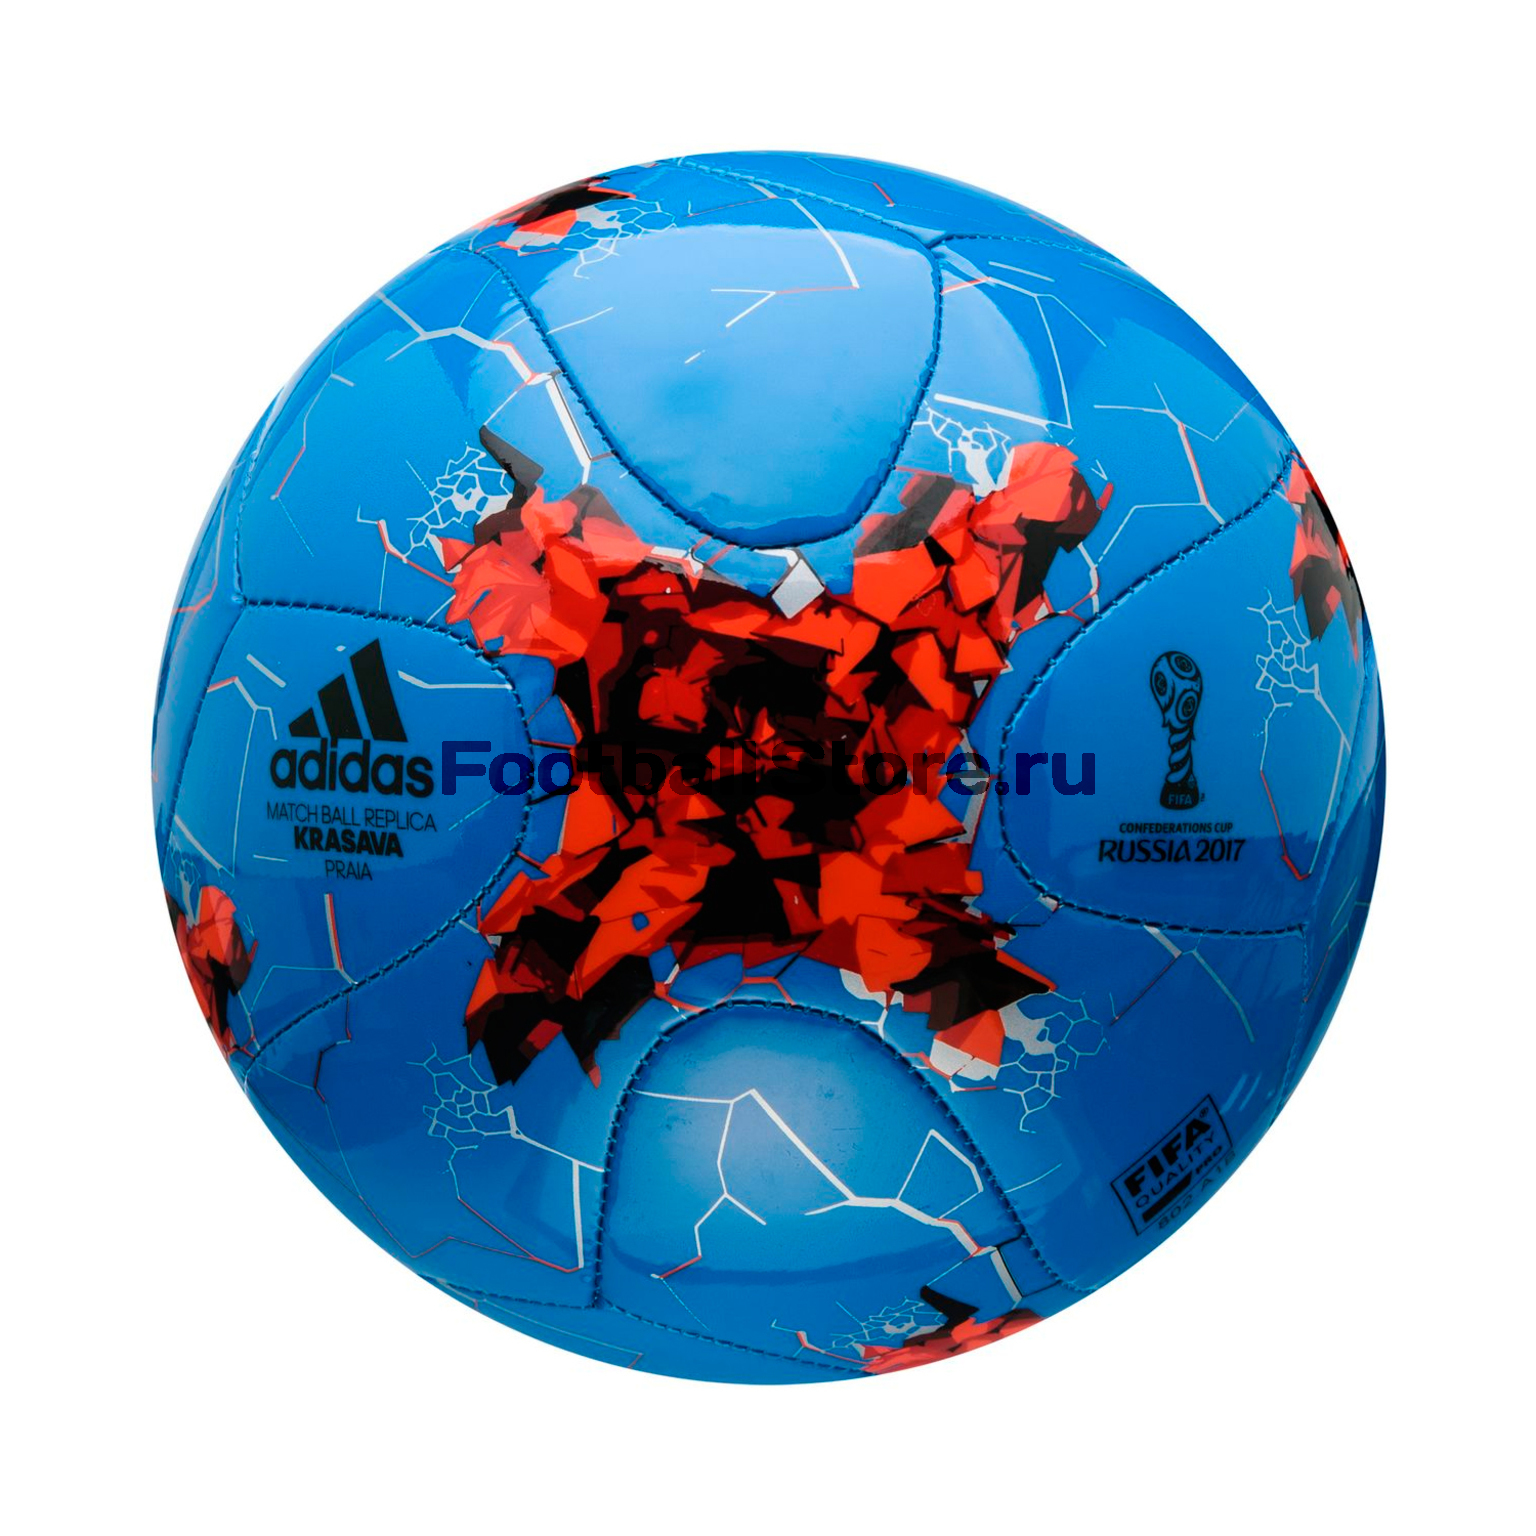 Купить Мяч для пляжного футбола Adidas CC Praia KRASAVA AZ3196 по ... c1b36028c61d4